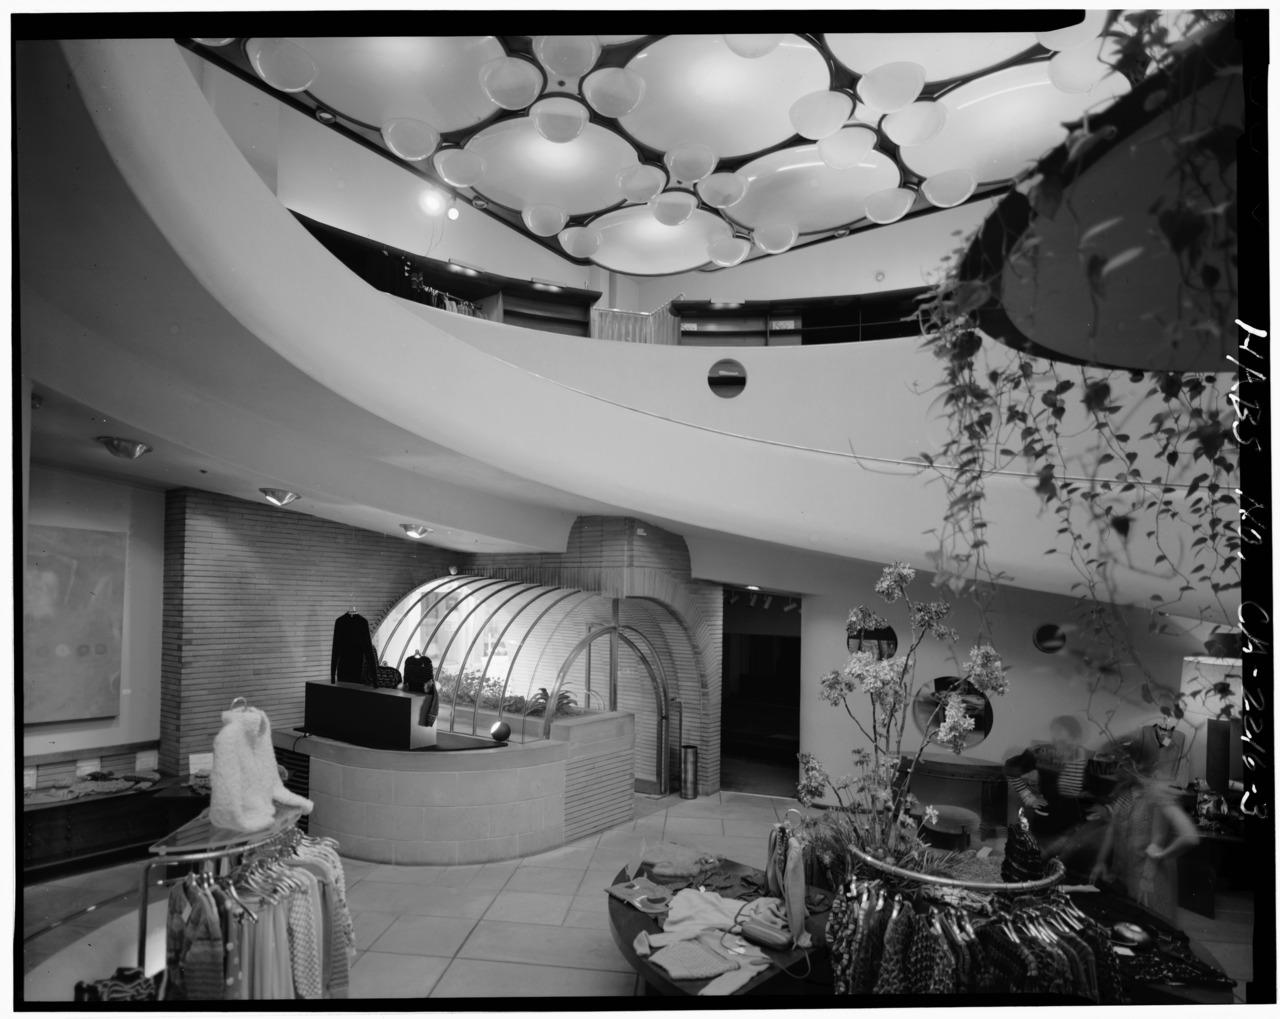 V.C. Morris Gift Shop in an archive photograph (via Historic American Buildings Survey)